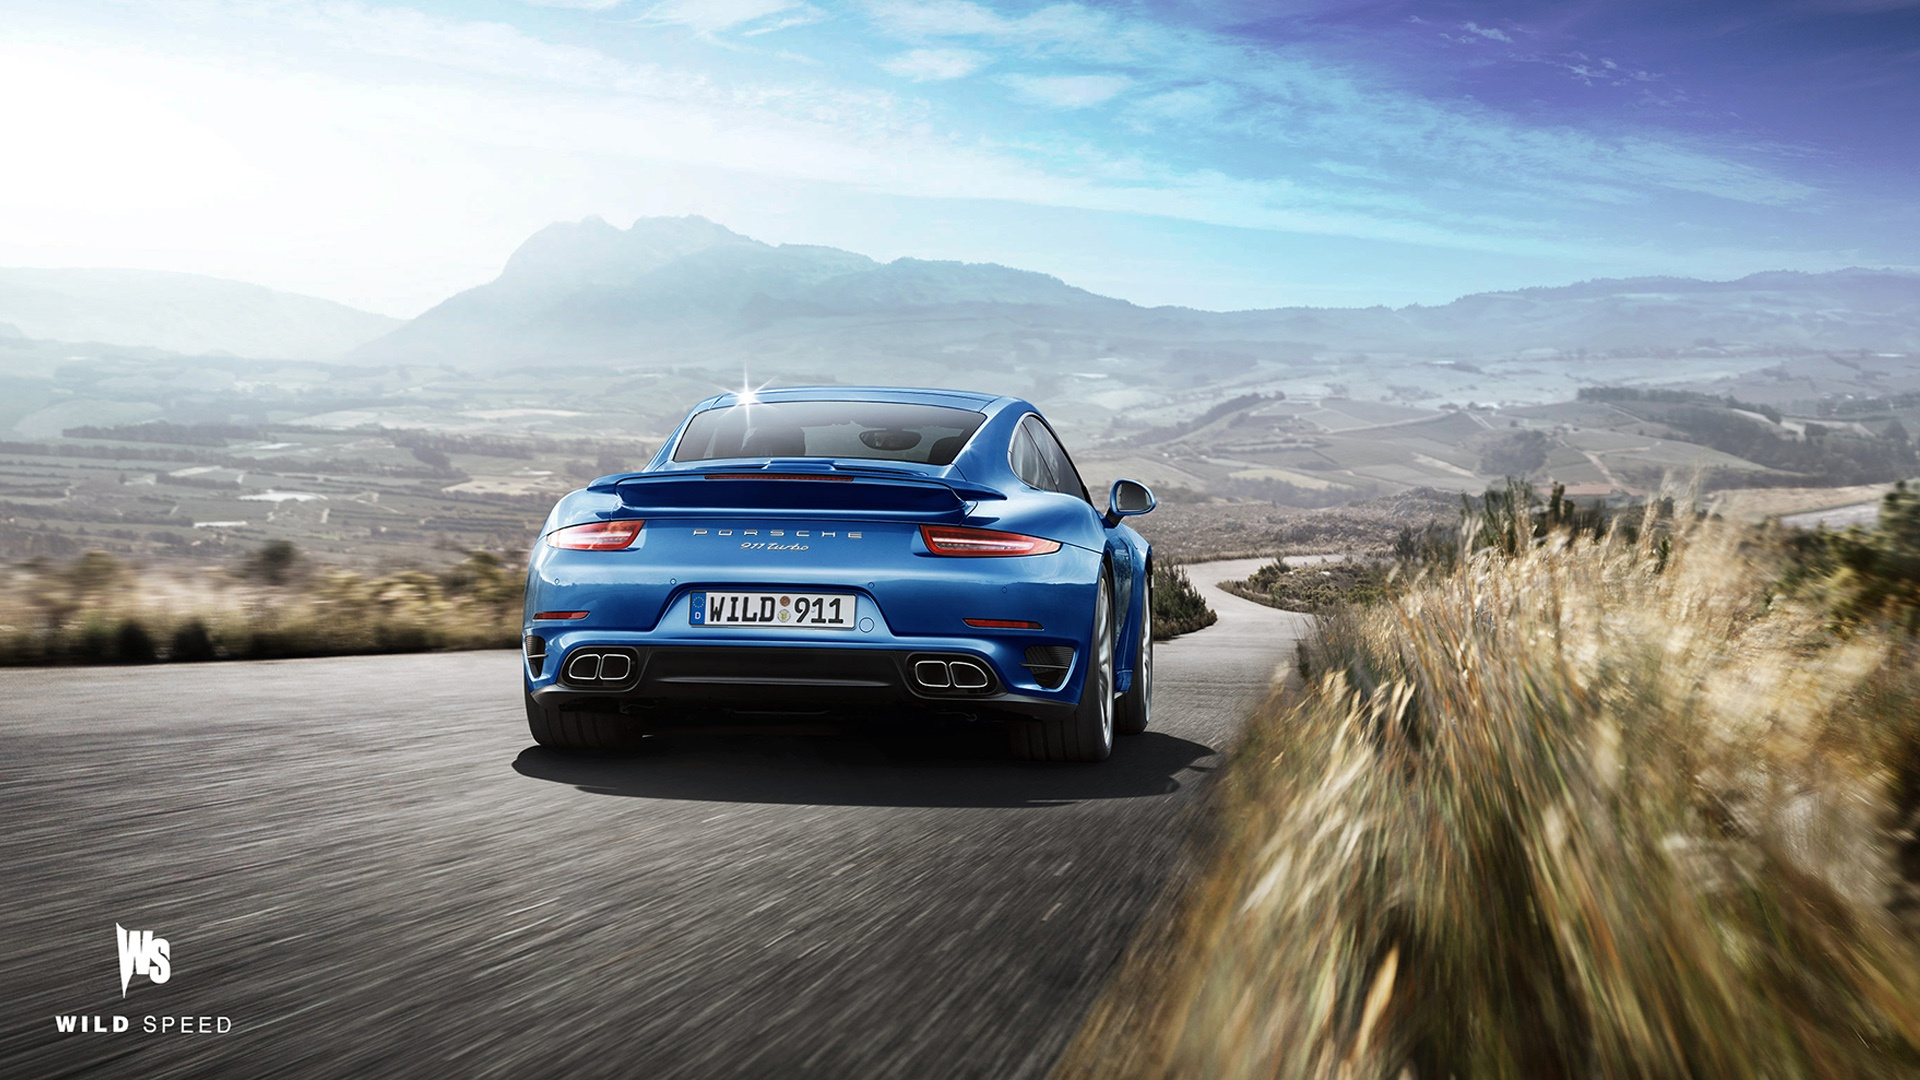 2014 Porsche 911 Turbo Wallpaper HD Car Wallpapers 1920x1080